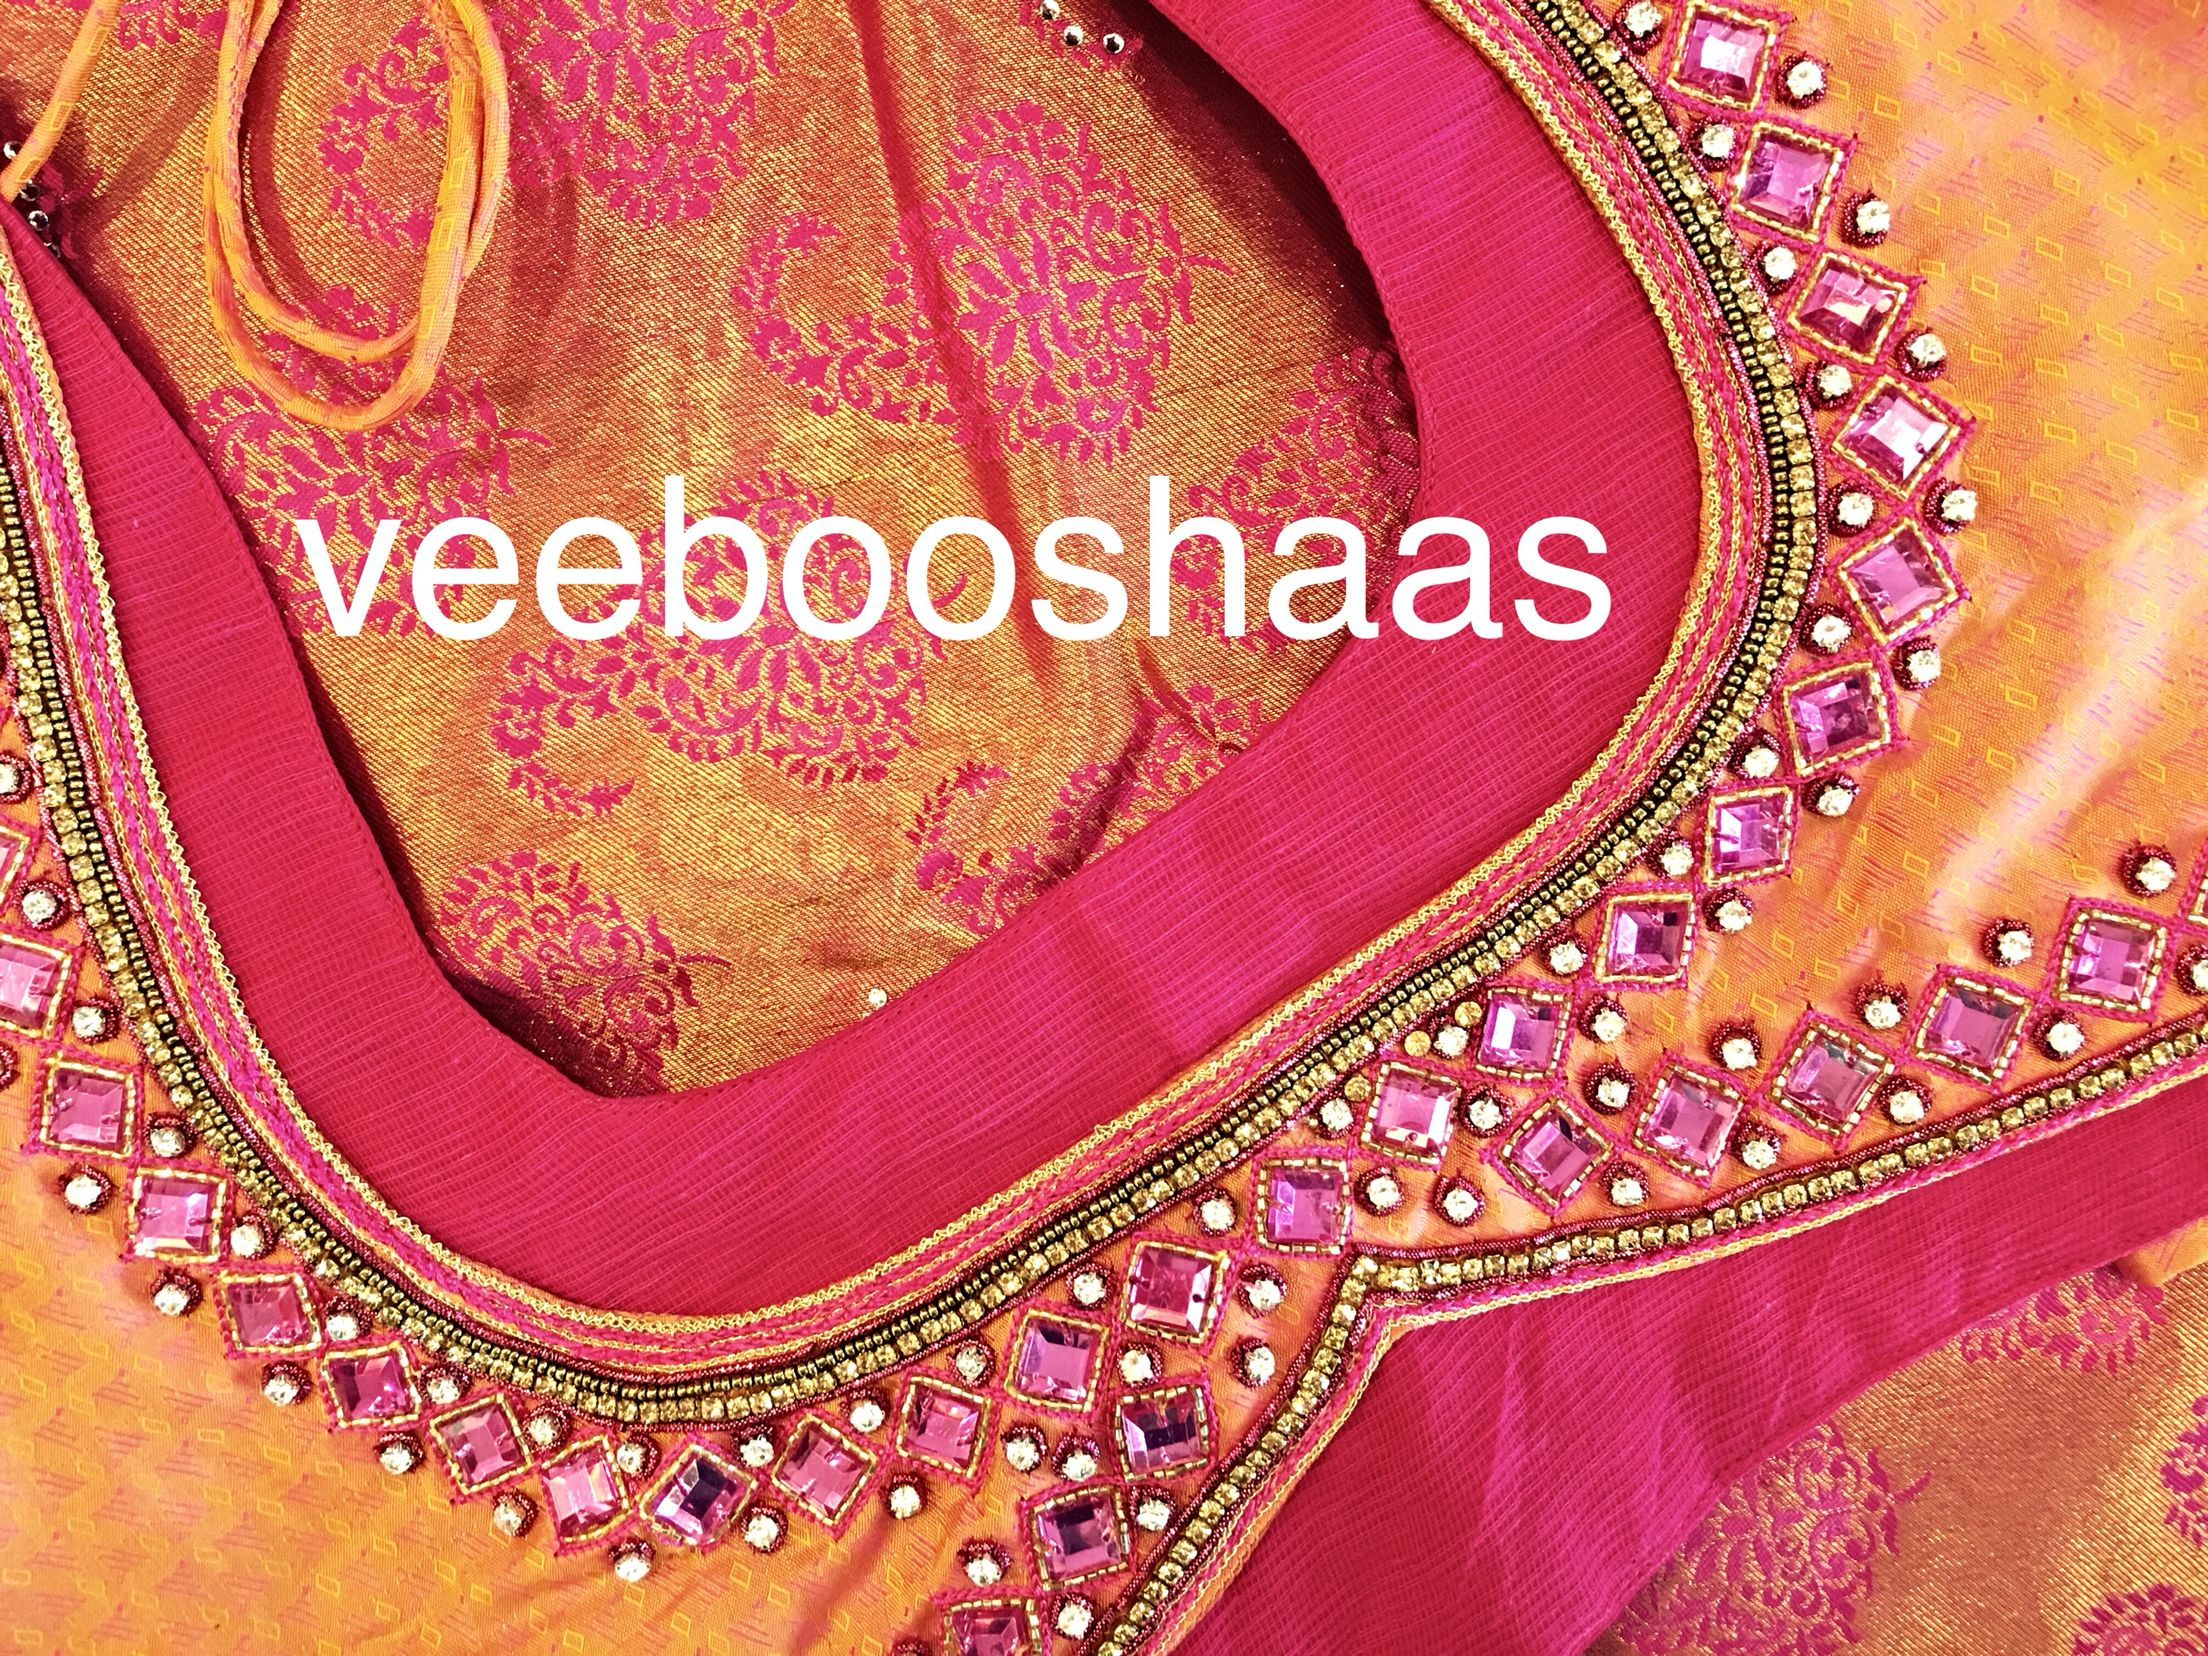 Pin by veebooshaas on veebooshaas pinterest blouse designs blouse patterns blouse designs work blouse saree blouse pattern design yellow saree embroidery designs affair embroidery patterns bankloansurffo Images